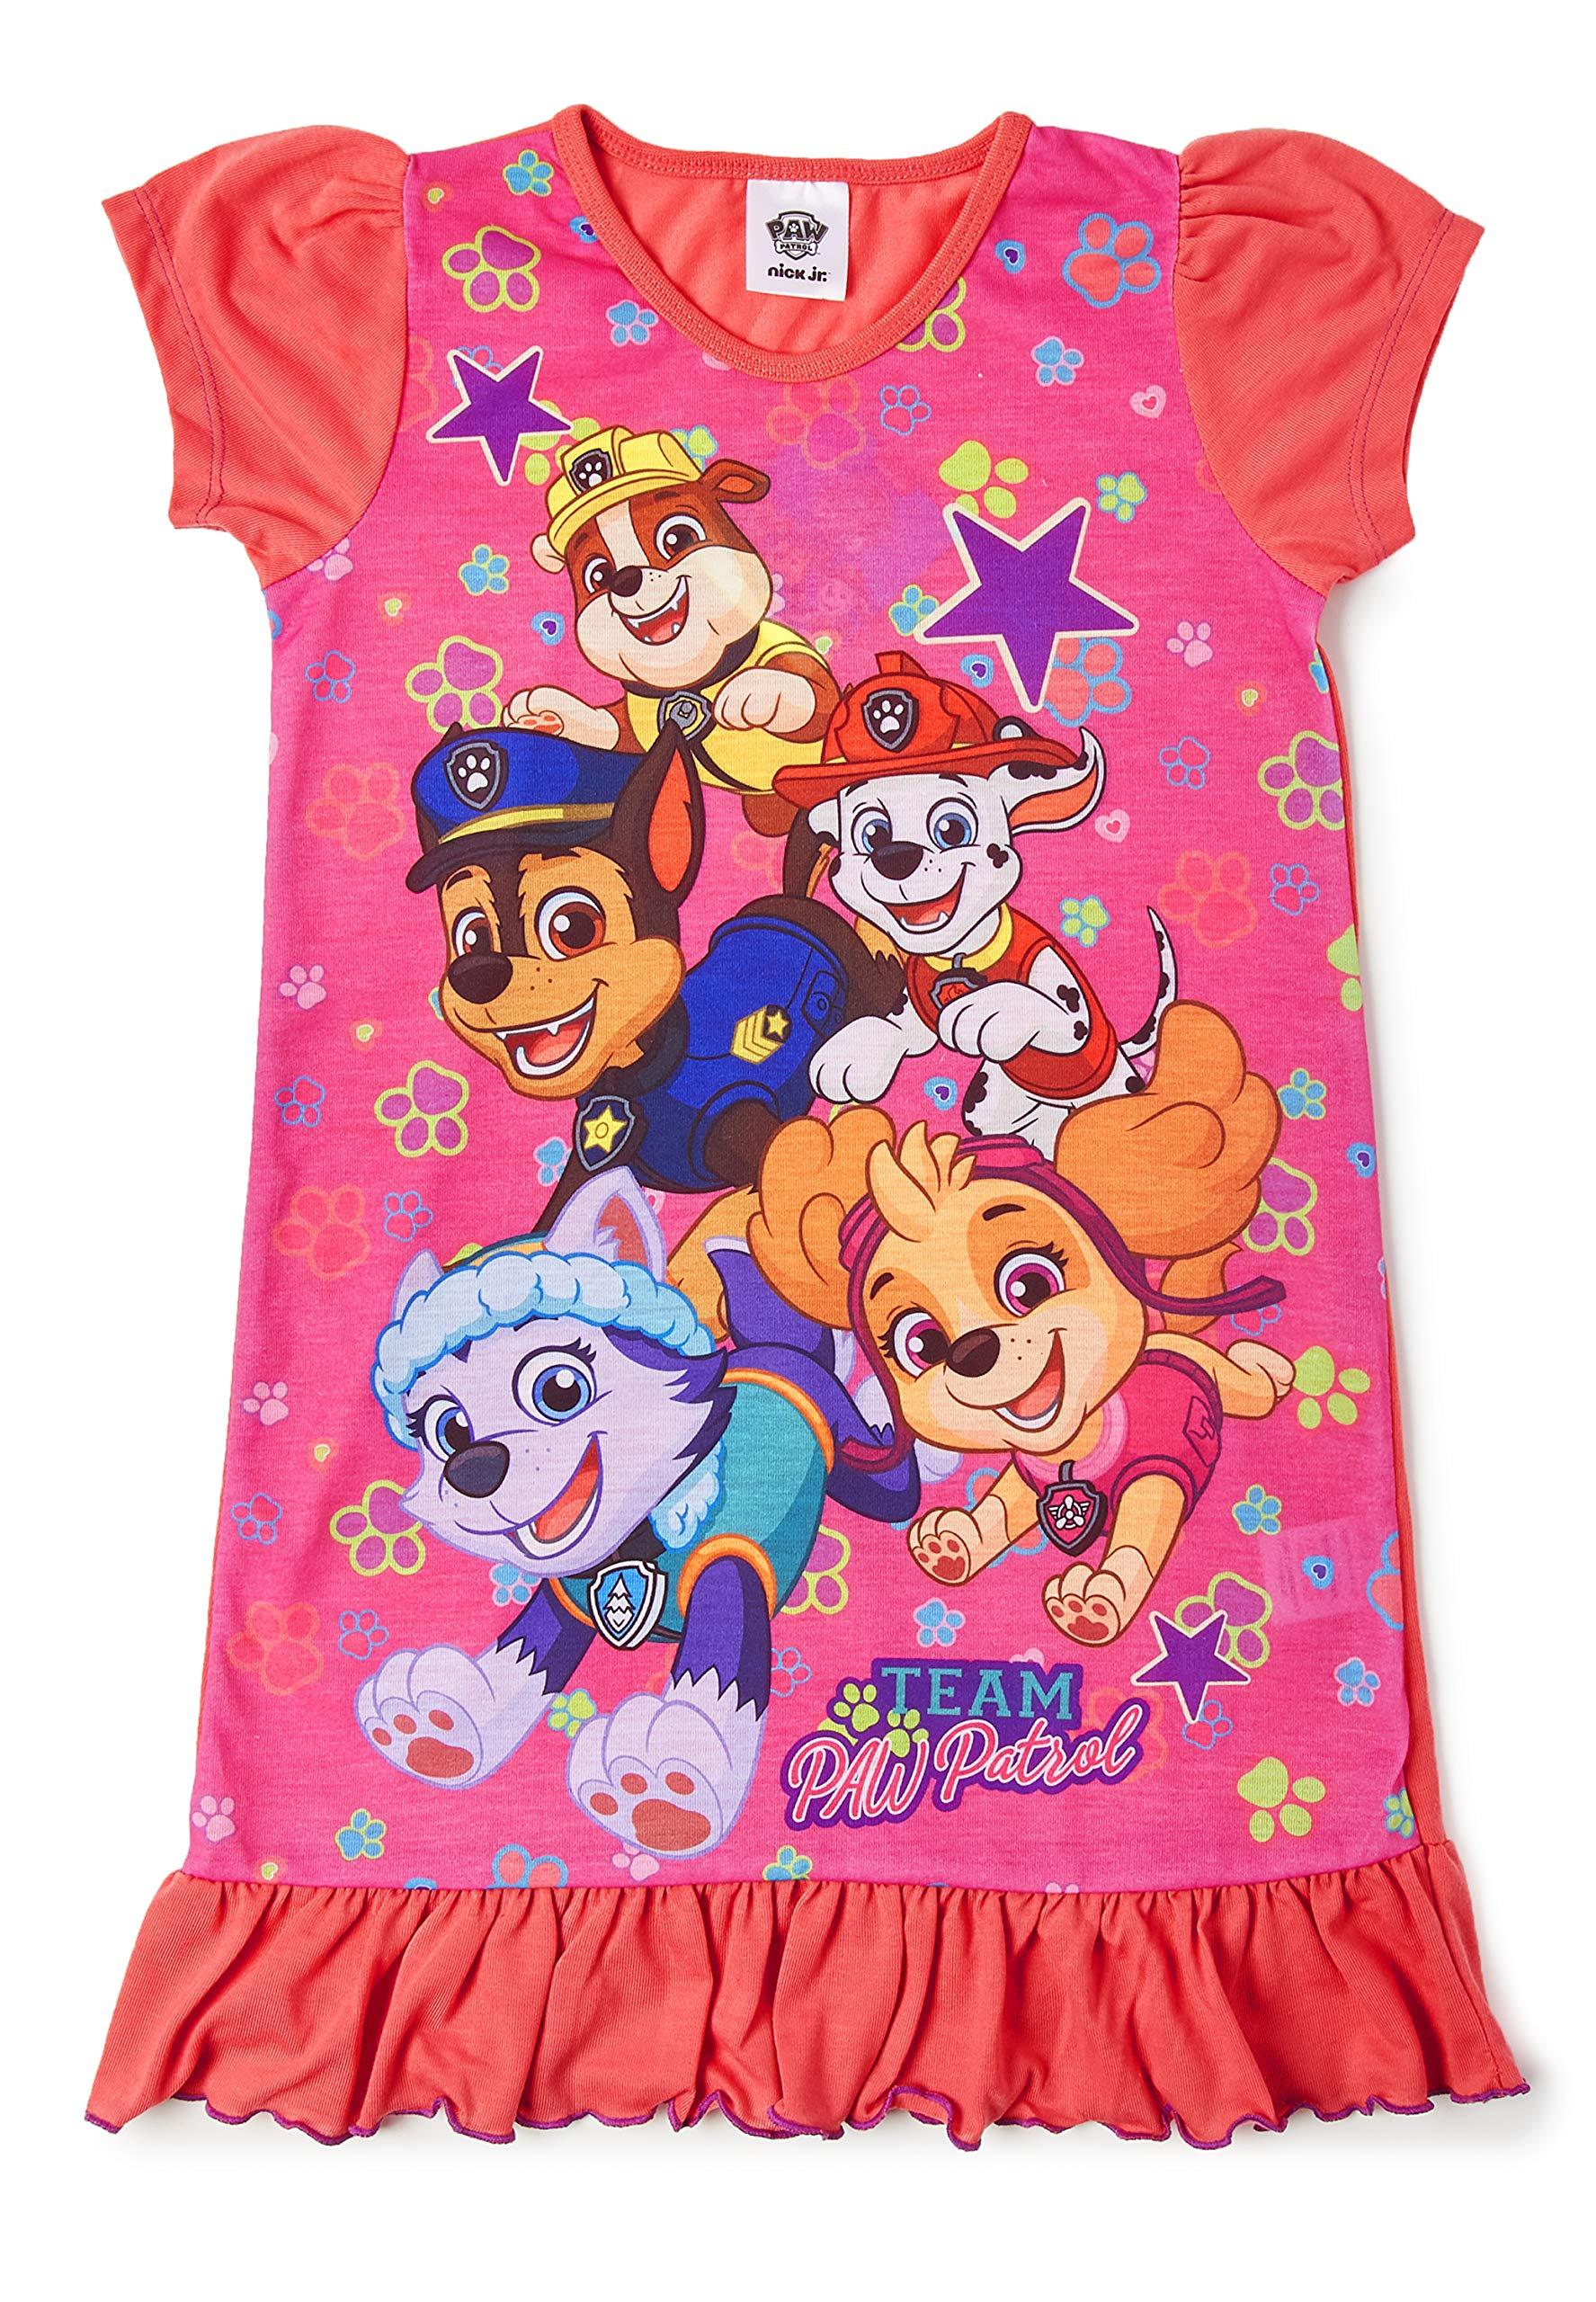 Girls Nightgowns Princess Nightie Nightdress Short Sleeve Ruffled Night Dress for 2-8 Years Kids Gift Blue